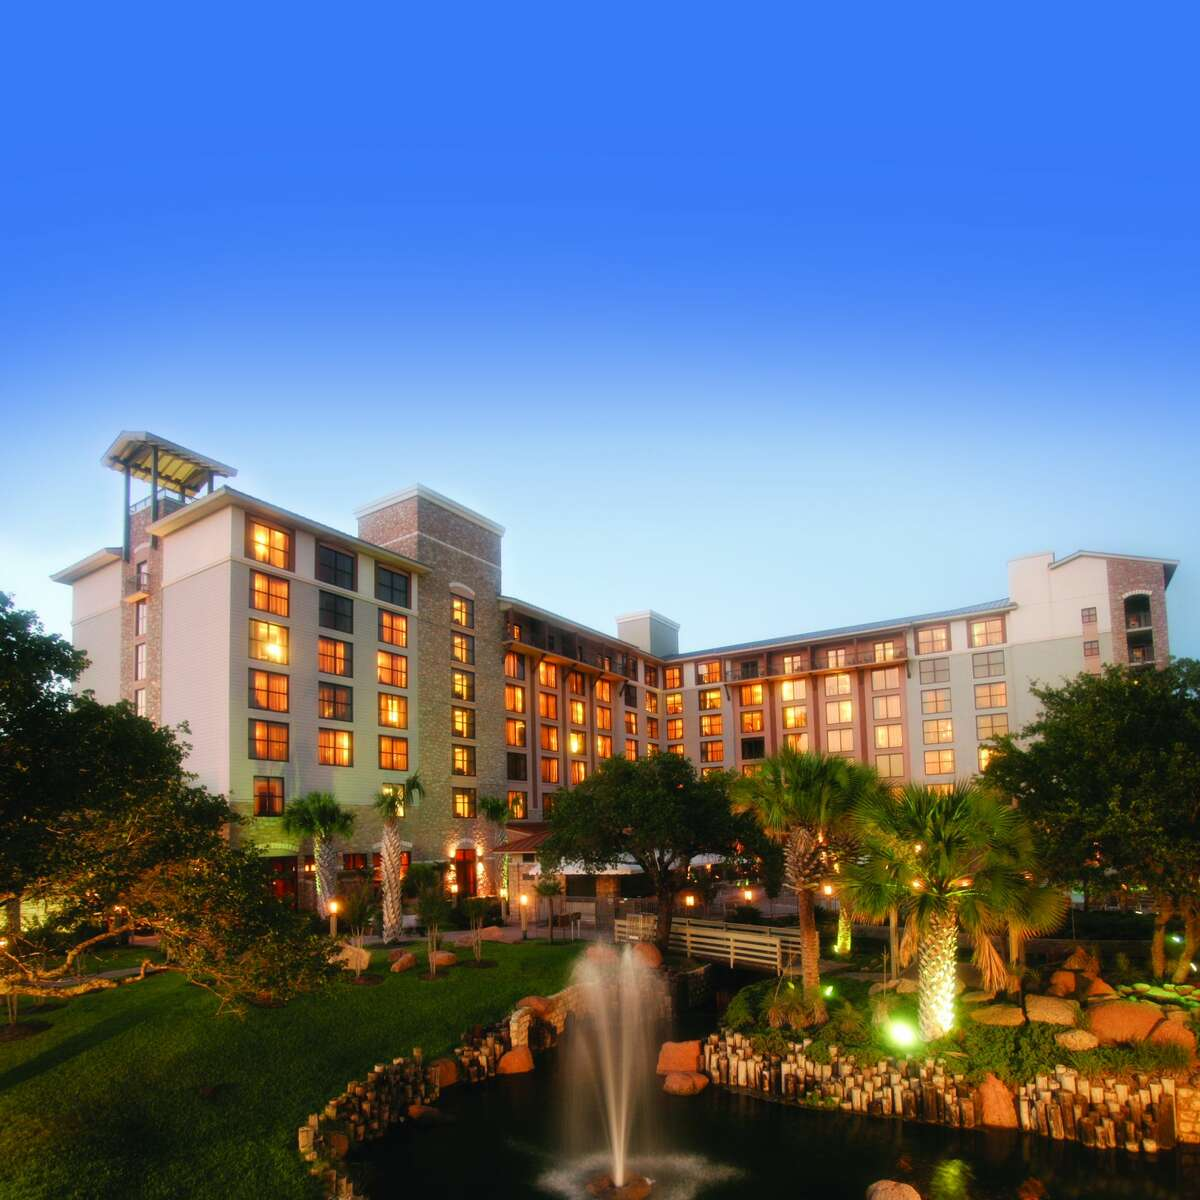 Horseshoe Bay Resort Where: 200 Hi Circle North Horseshoe Bay, Texas 78657